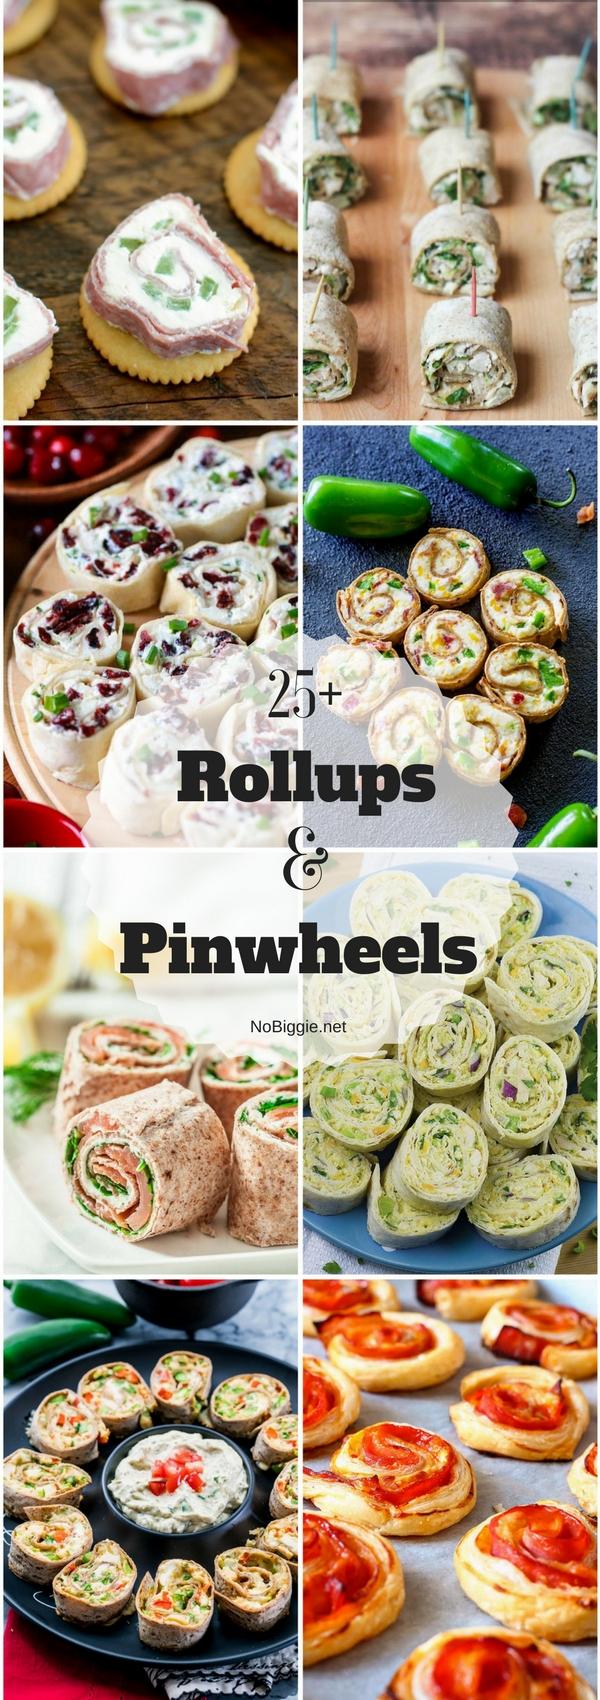 25+ Rollups and Pinwheels | NoBiggie.net